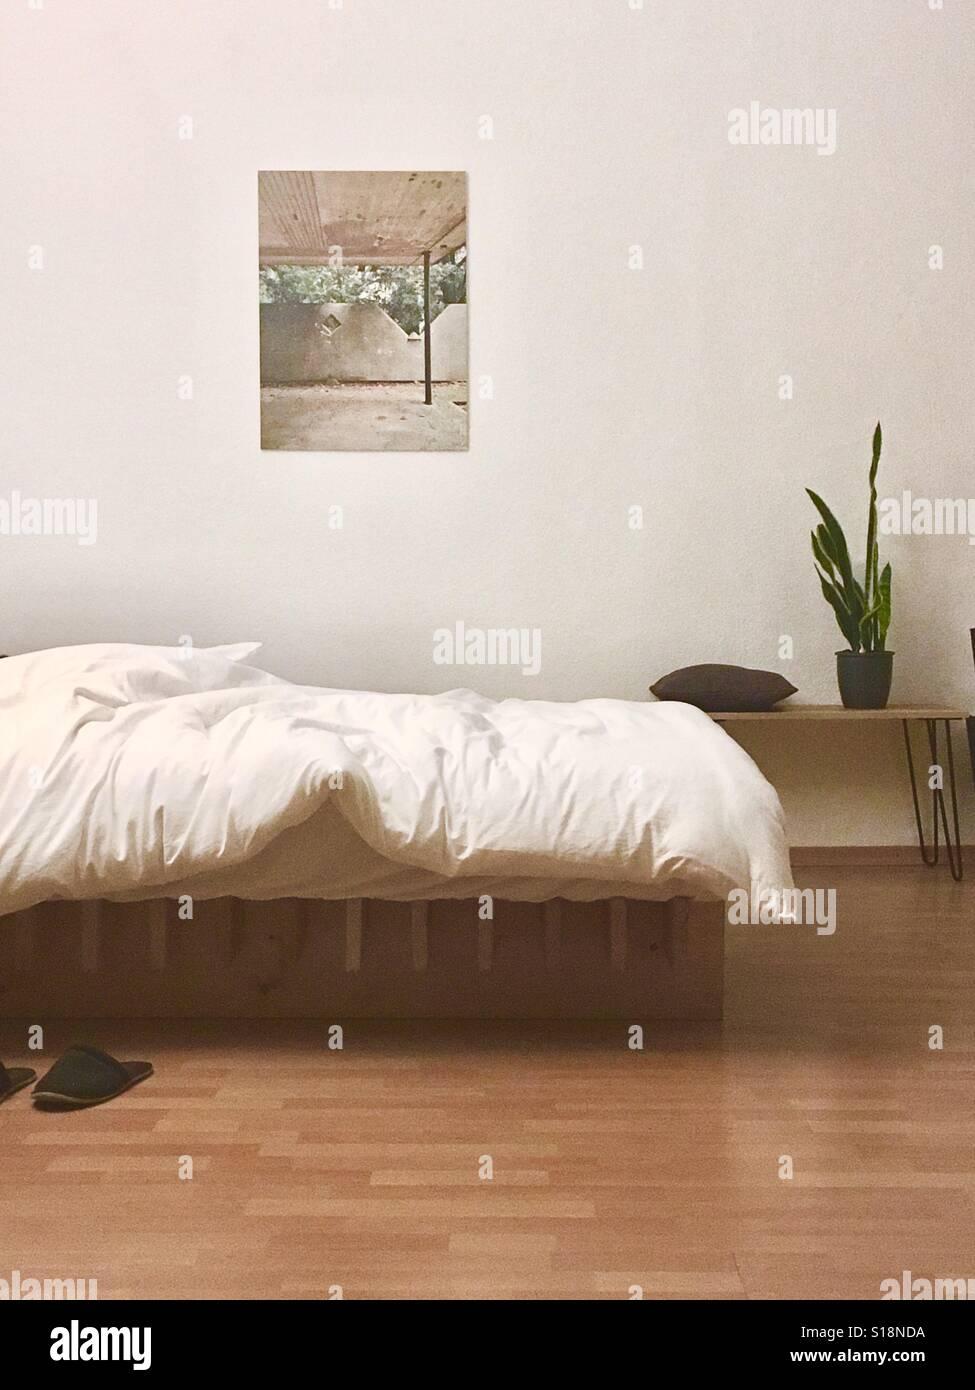 C8 Alamy Com Comp S18nda Bedroom Wall Photography